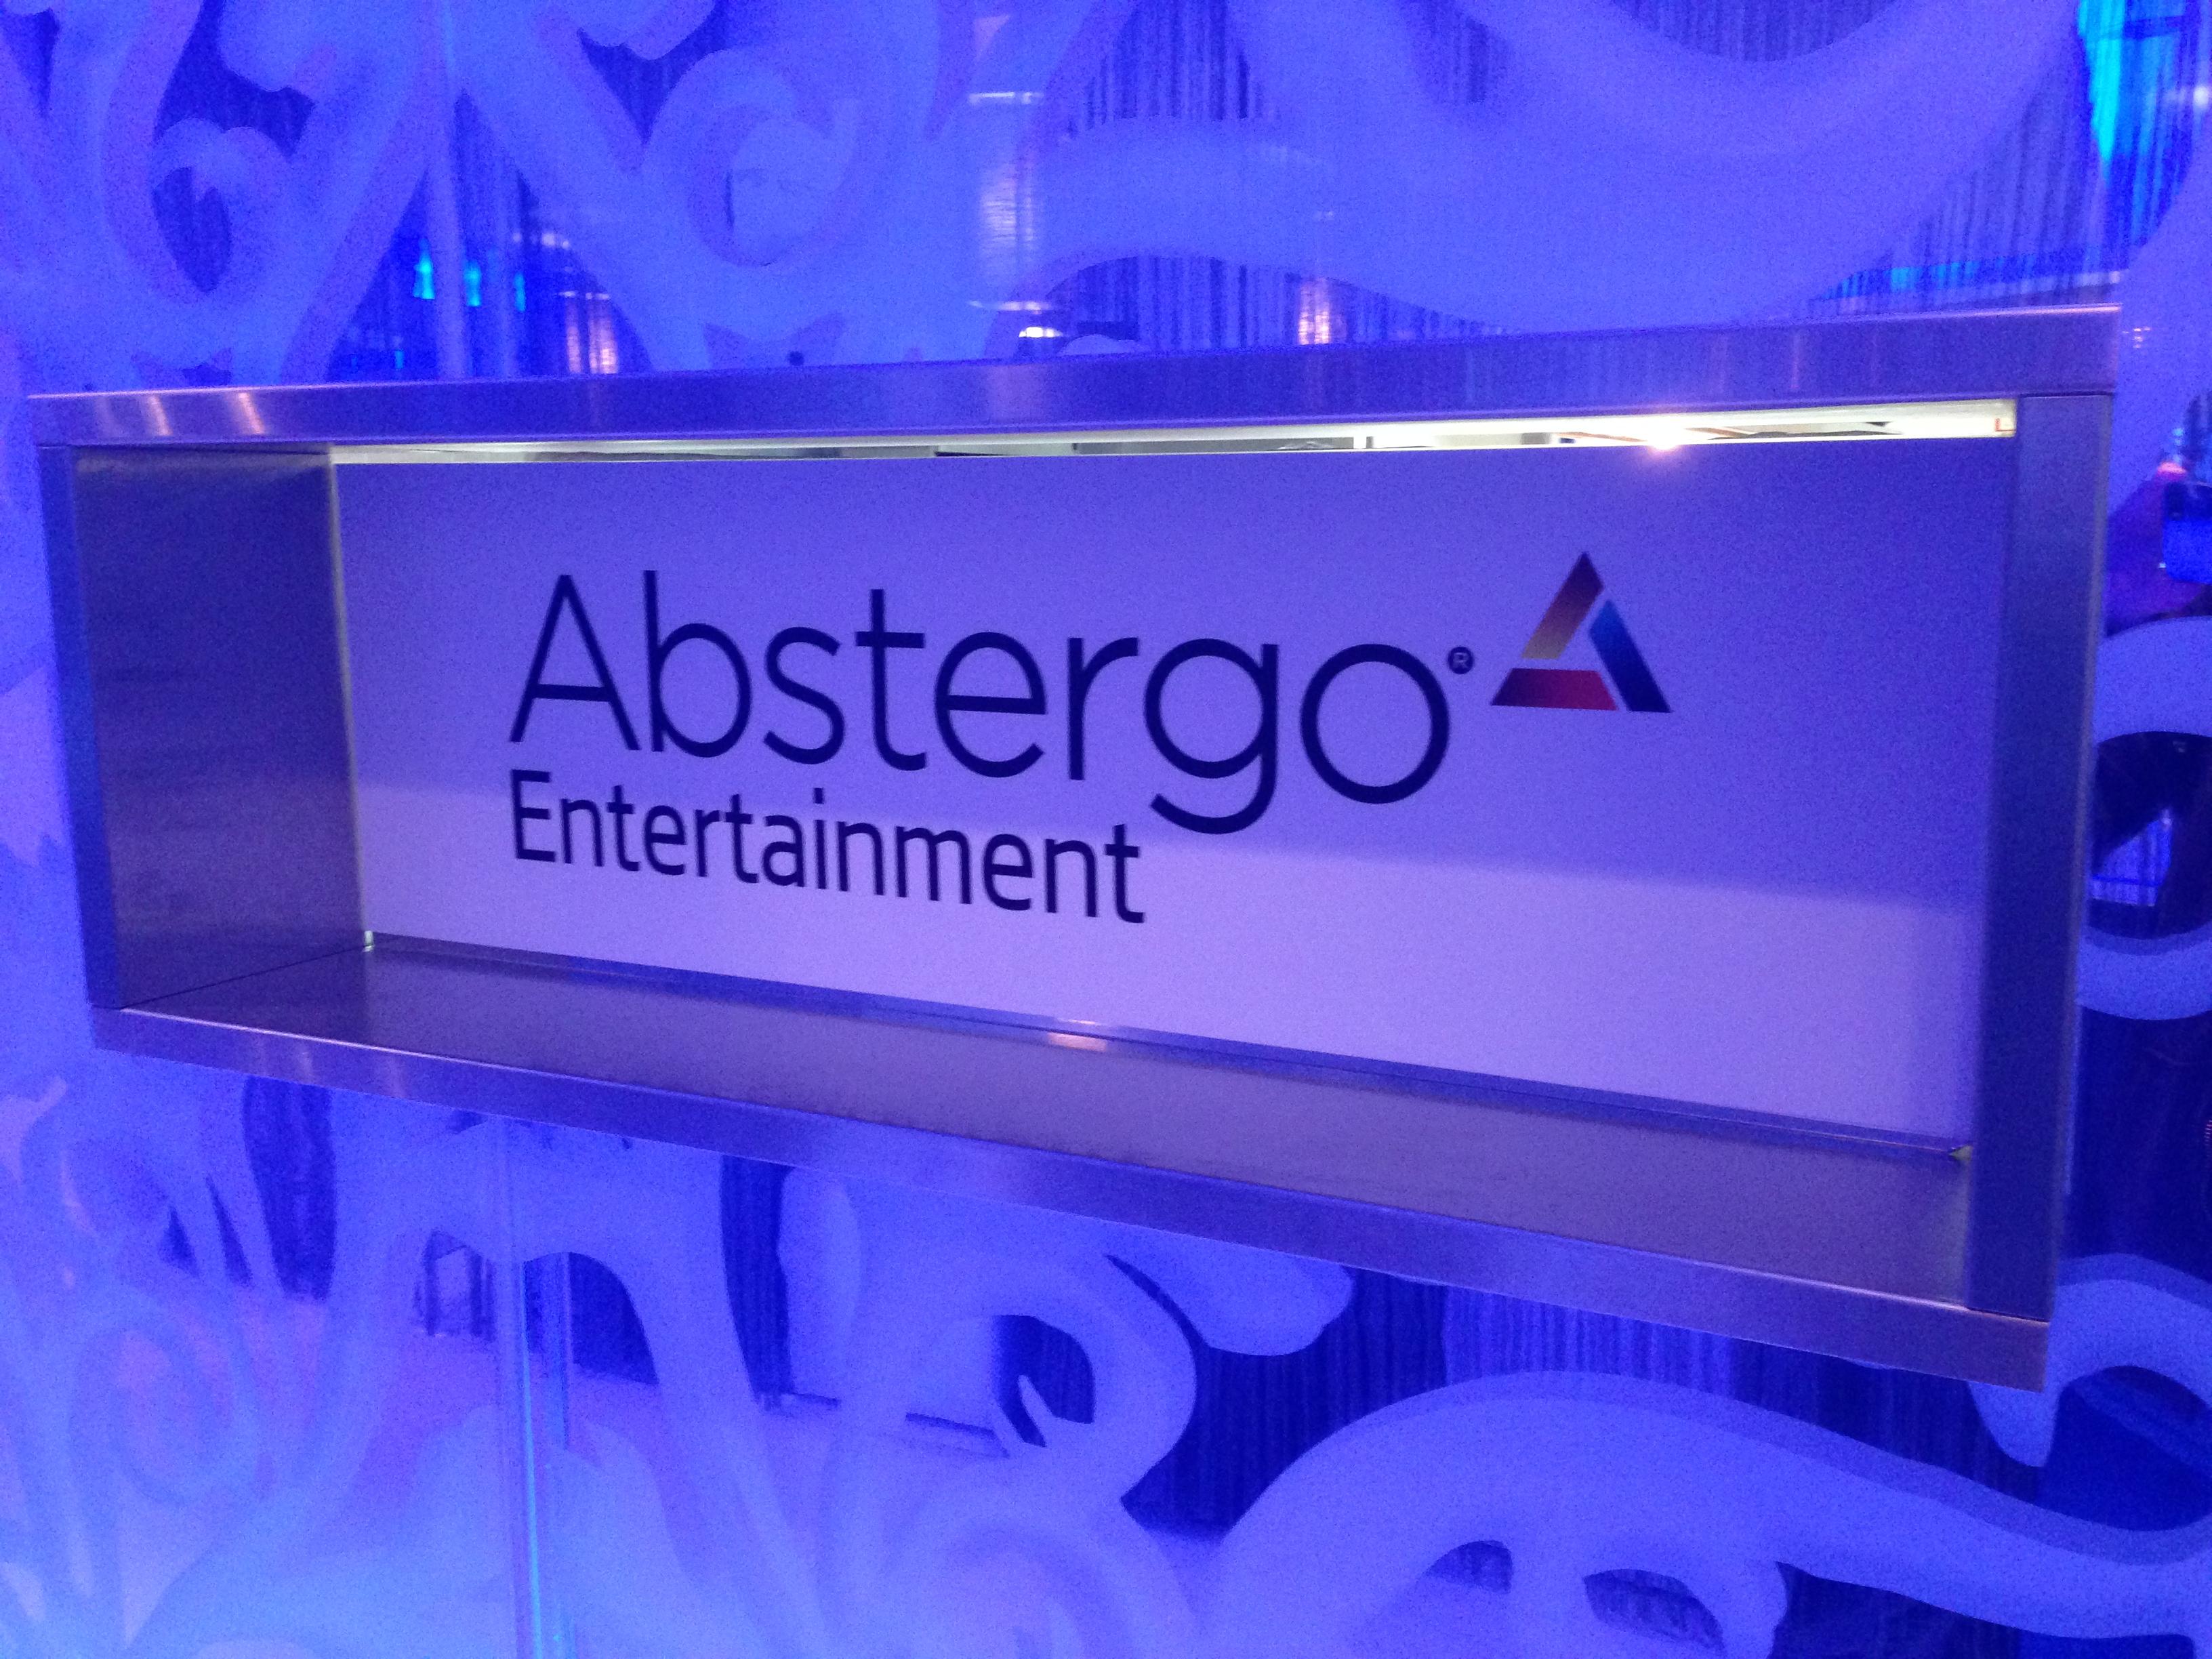 2013-10-06-AbstergoEntertainment.JPG